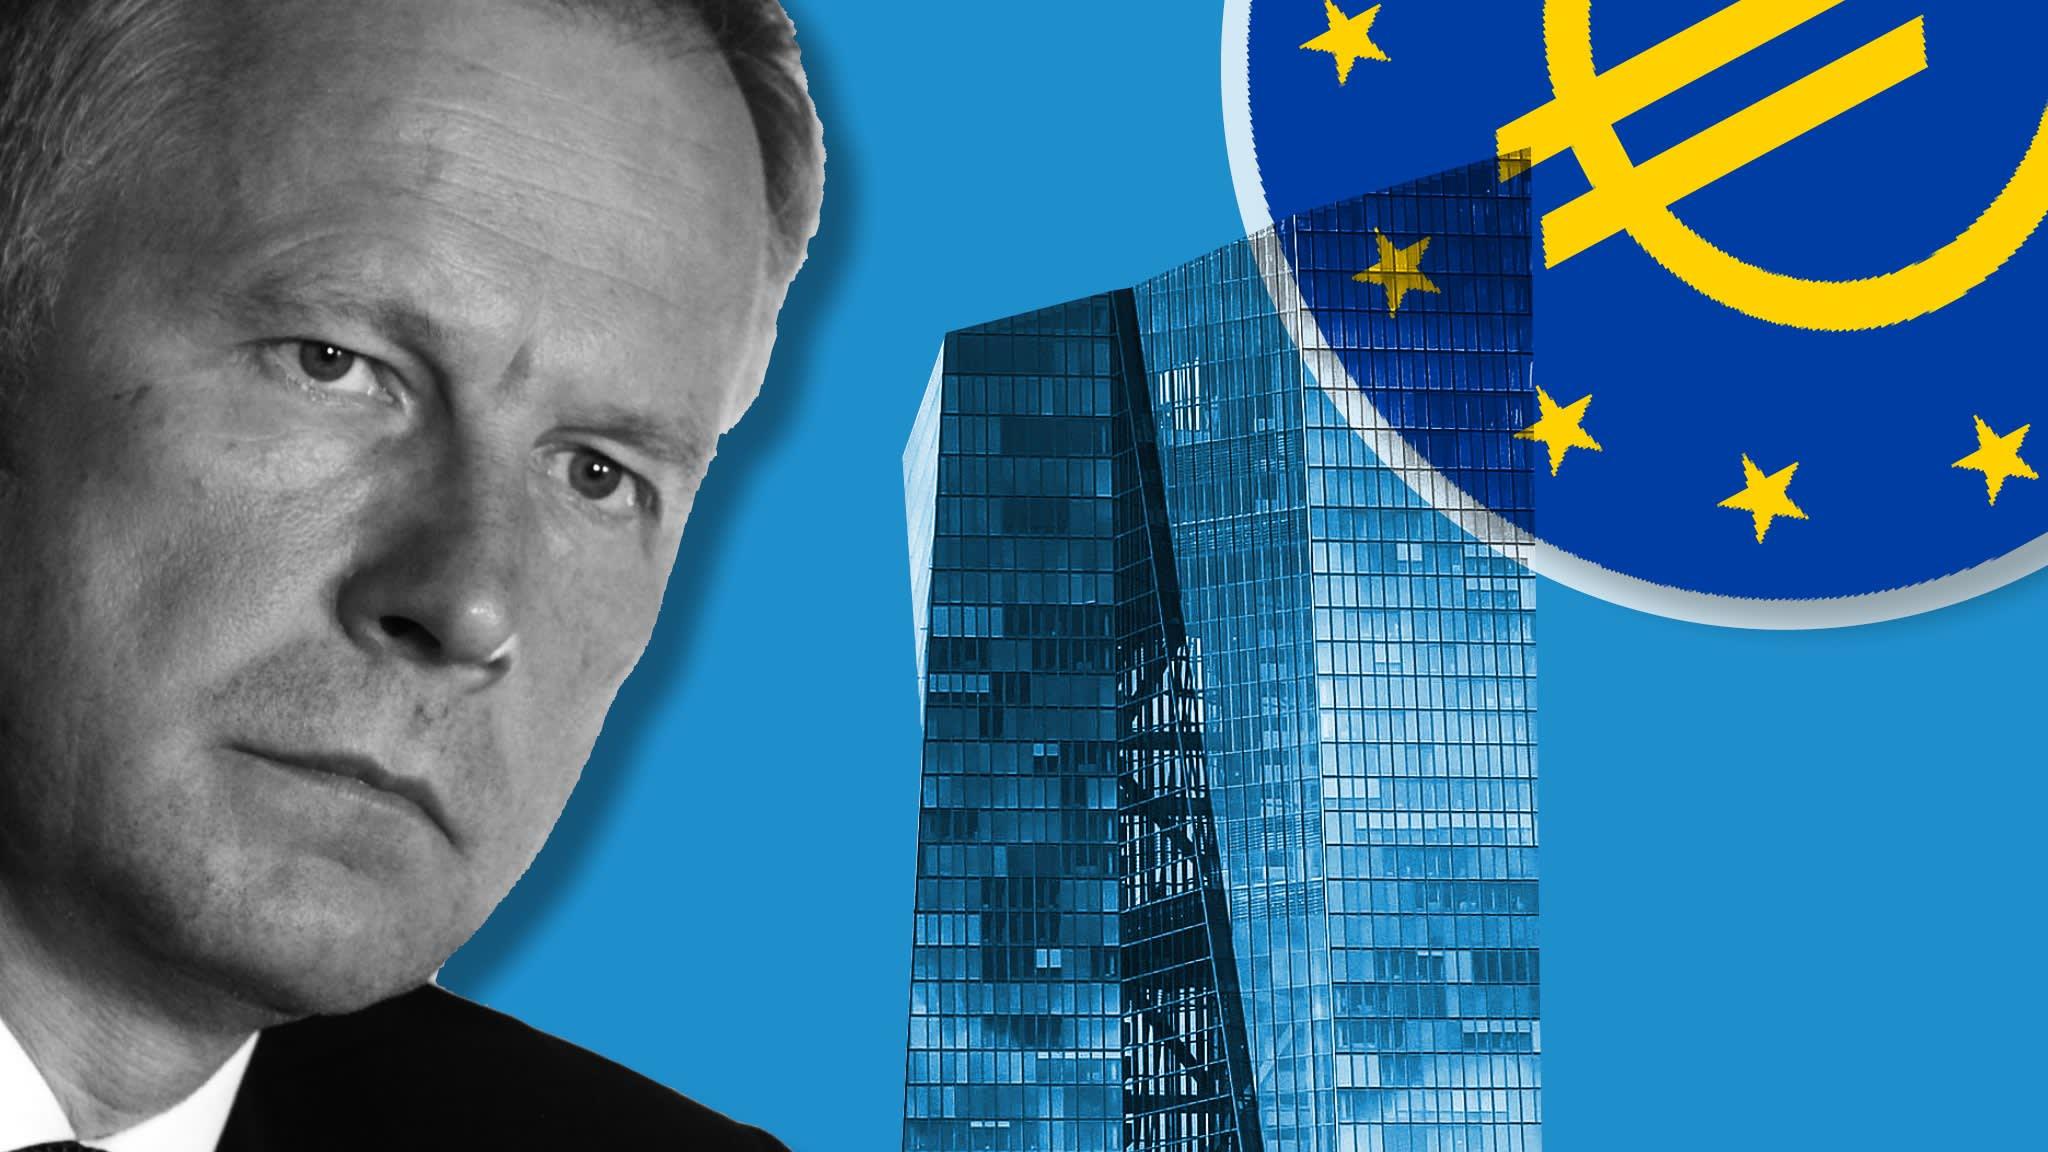 Latvian crisis illustrates limits of ECB's reach